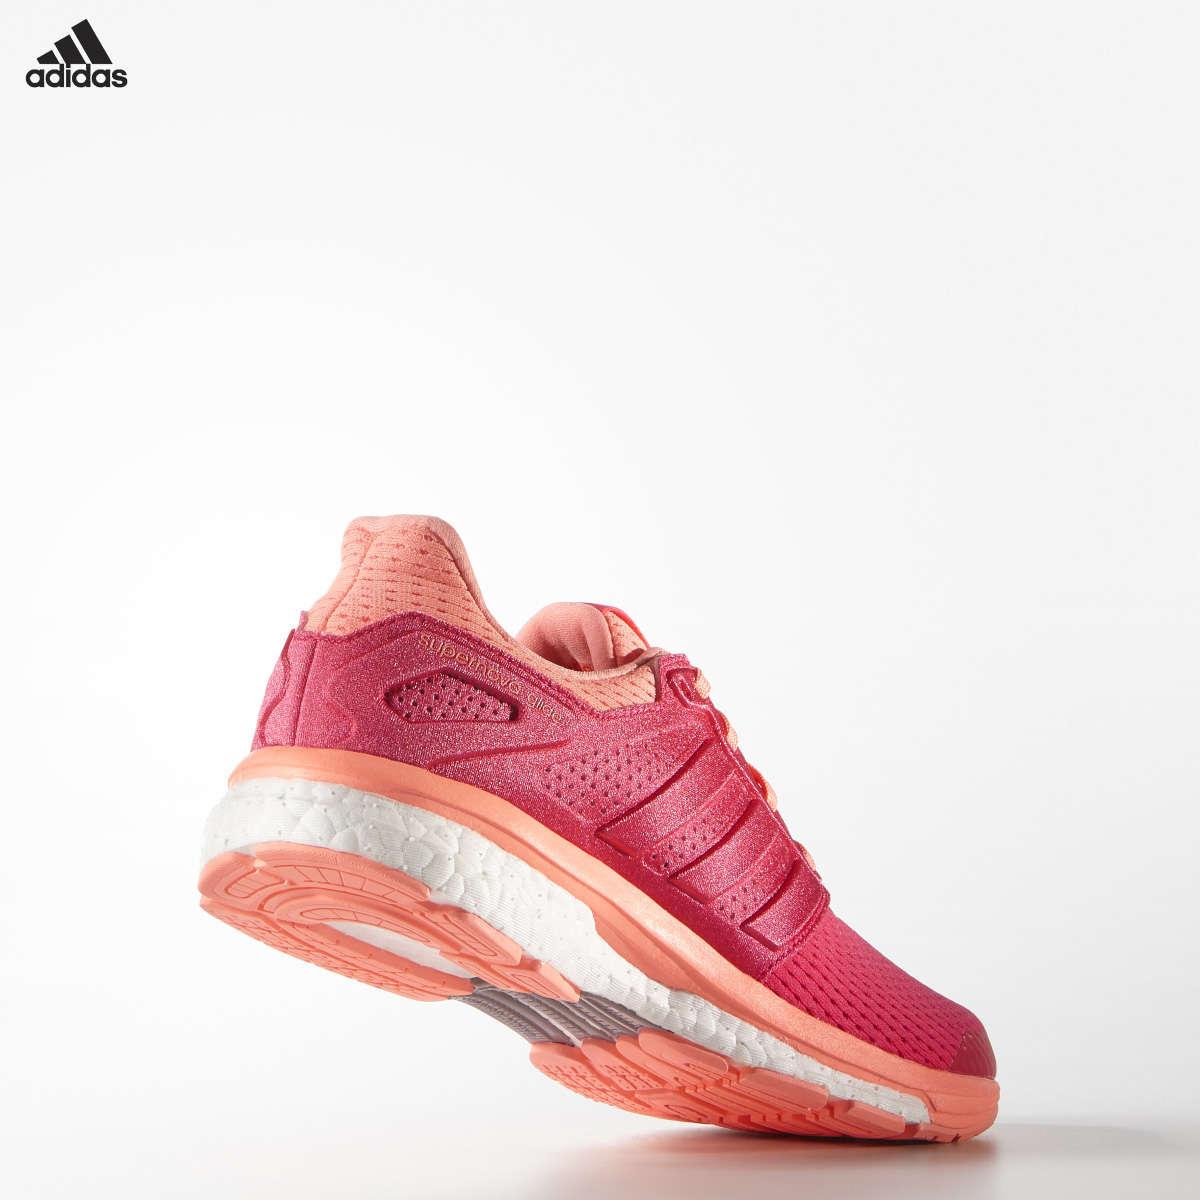 Adidas Chaussures Supernova Rouge jRBpbIFXv